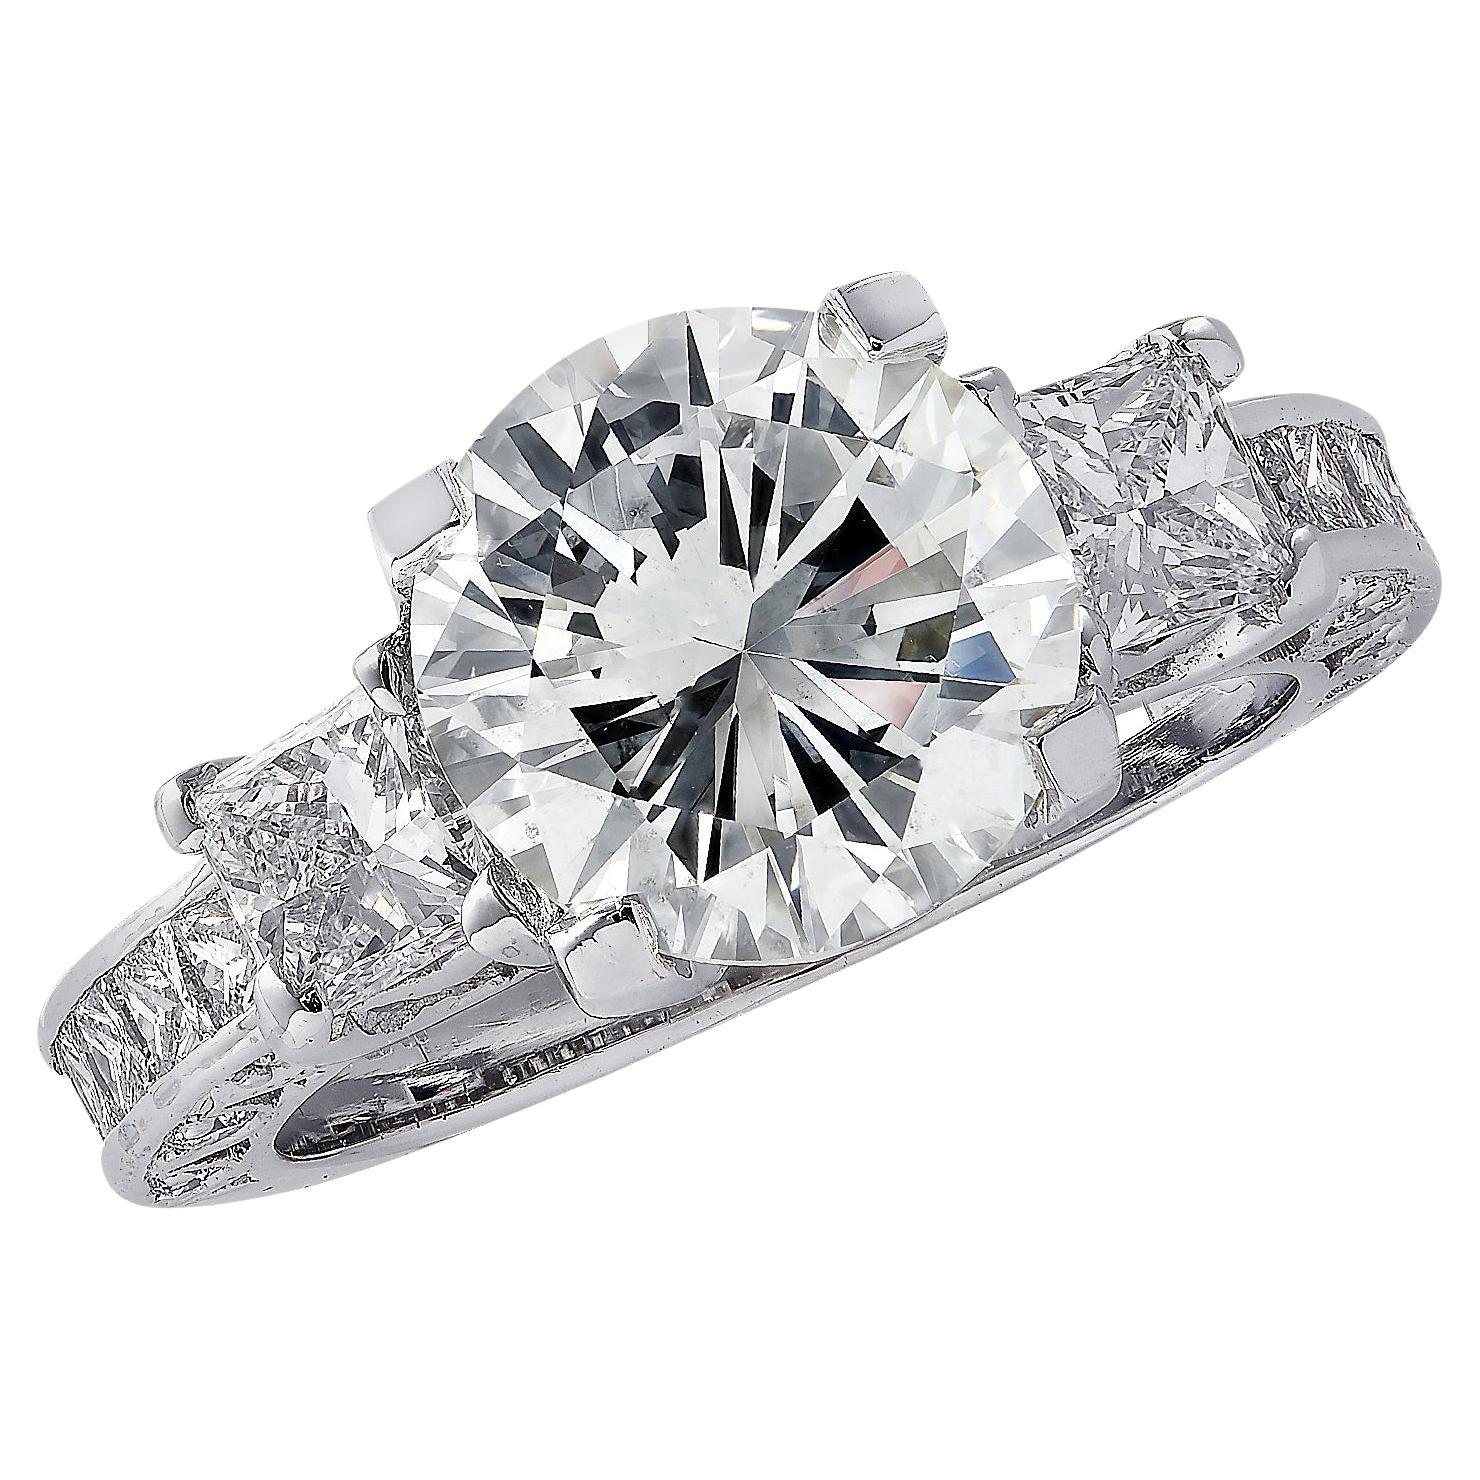 Vivid Diamonds GIA Certified 3.03 Carat Diamond Engagement Ring